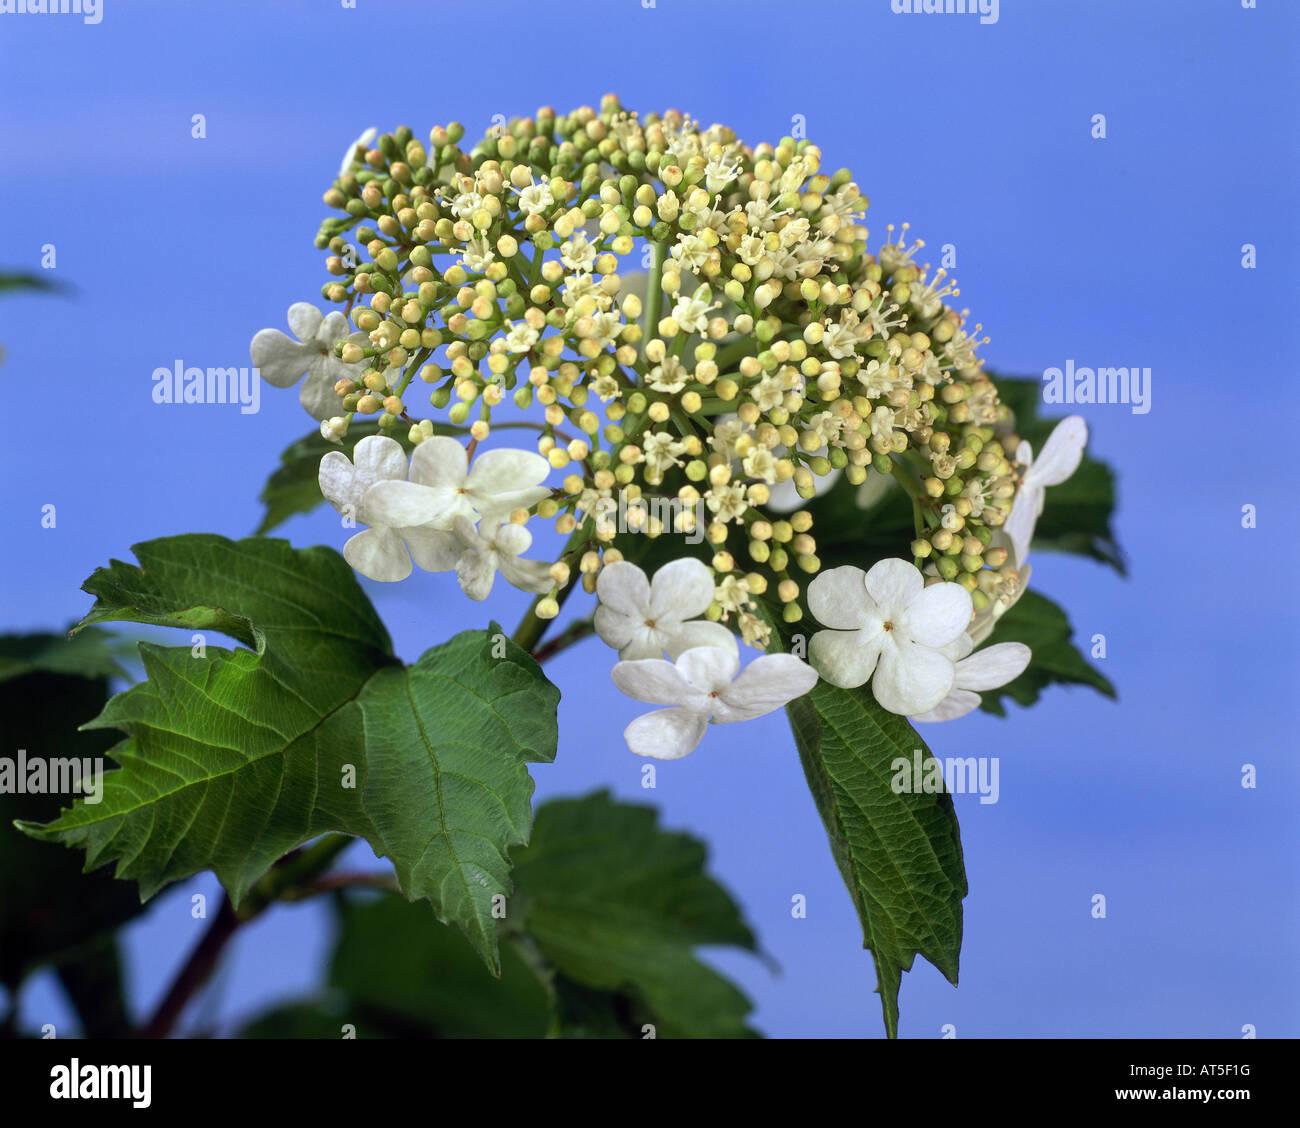 botany, Viburnum, Wayfaring Tree, (Viburnum lantana), blossom, Additional-Rights-Clearance-Info-Not-Available - Stock Image